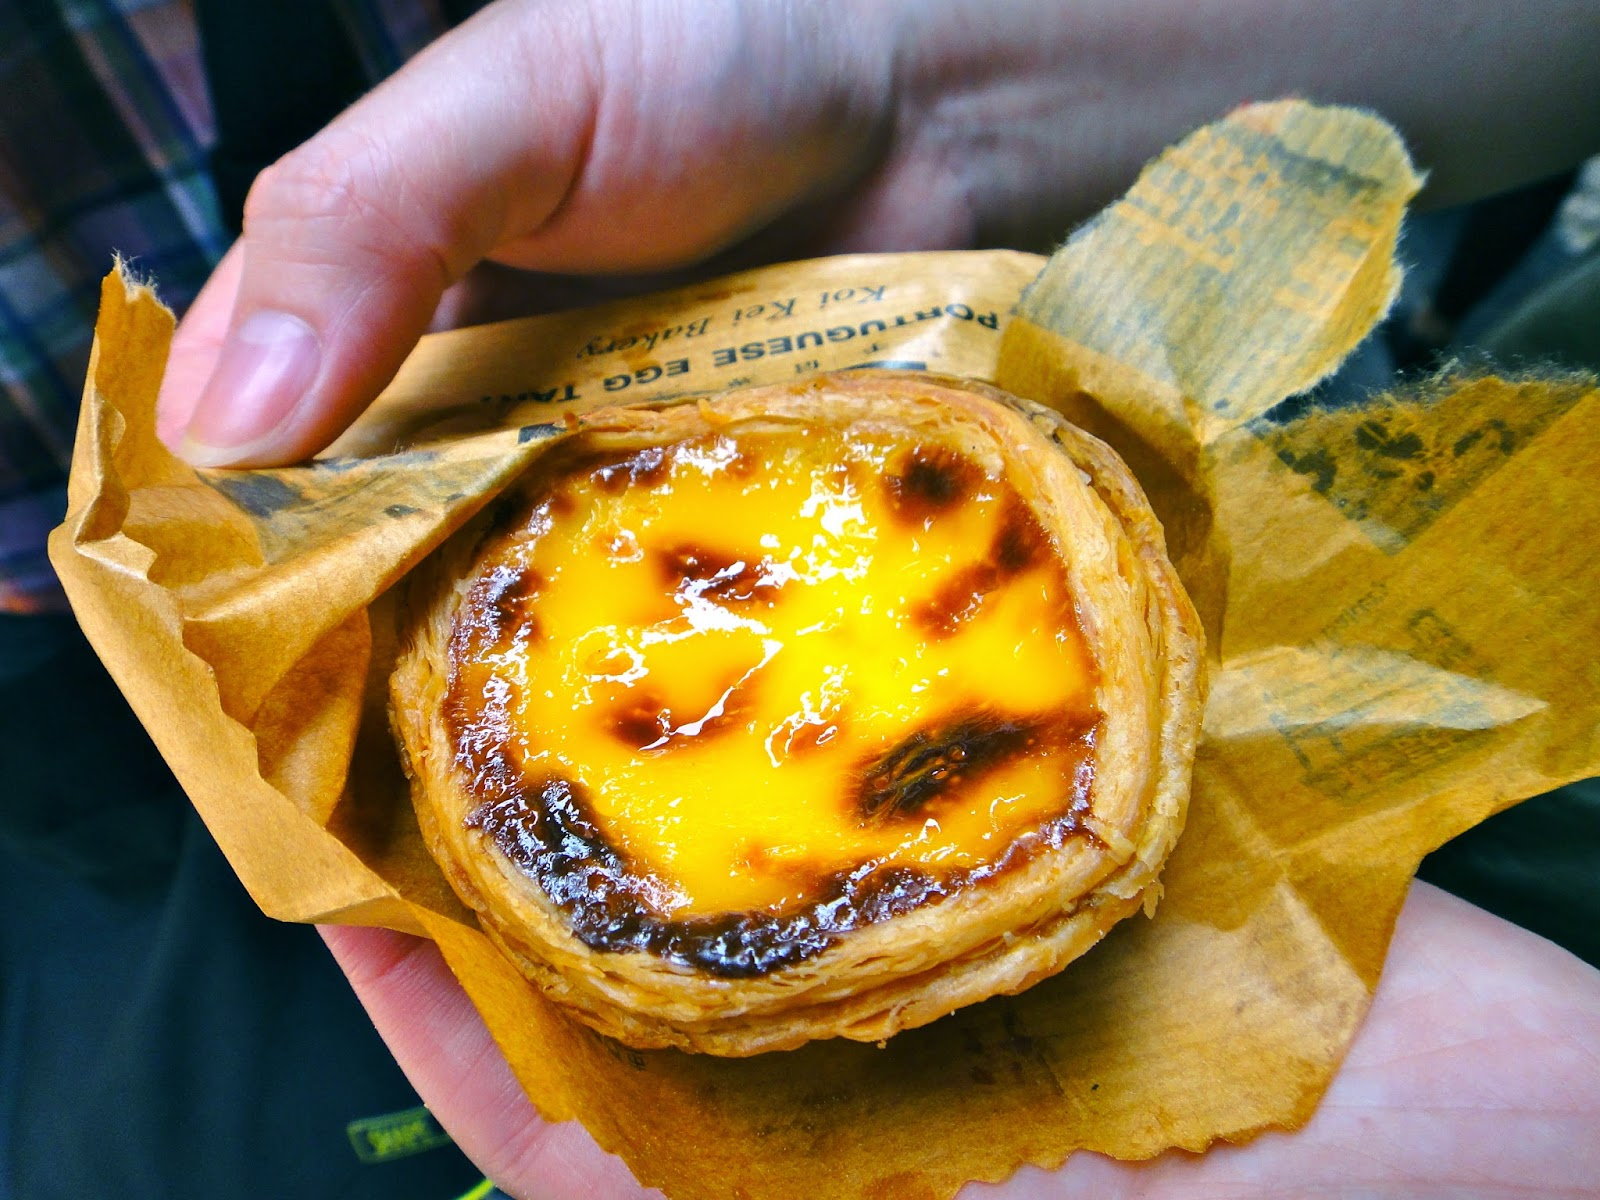 Macau Egg Tart sold at Senado Square Macau